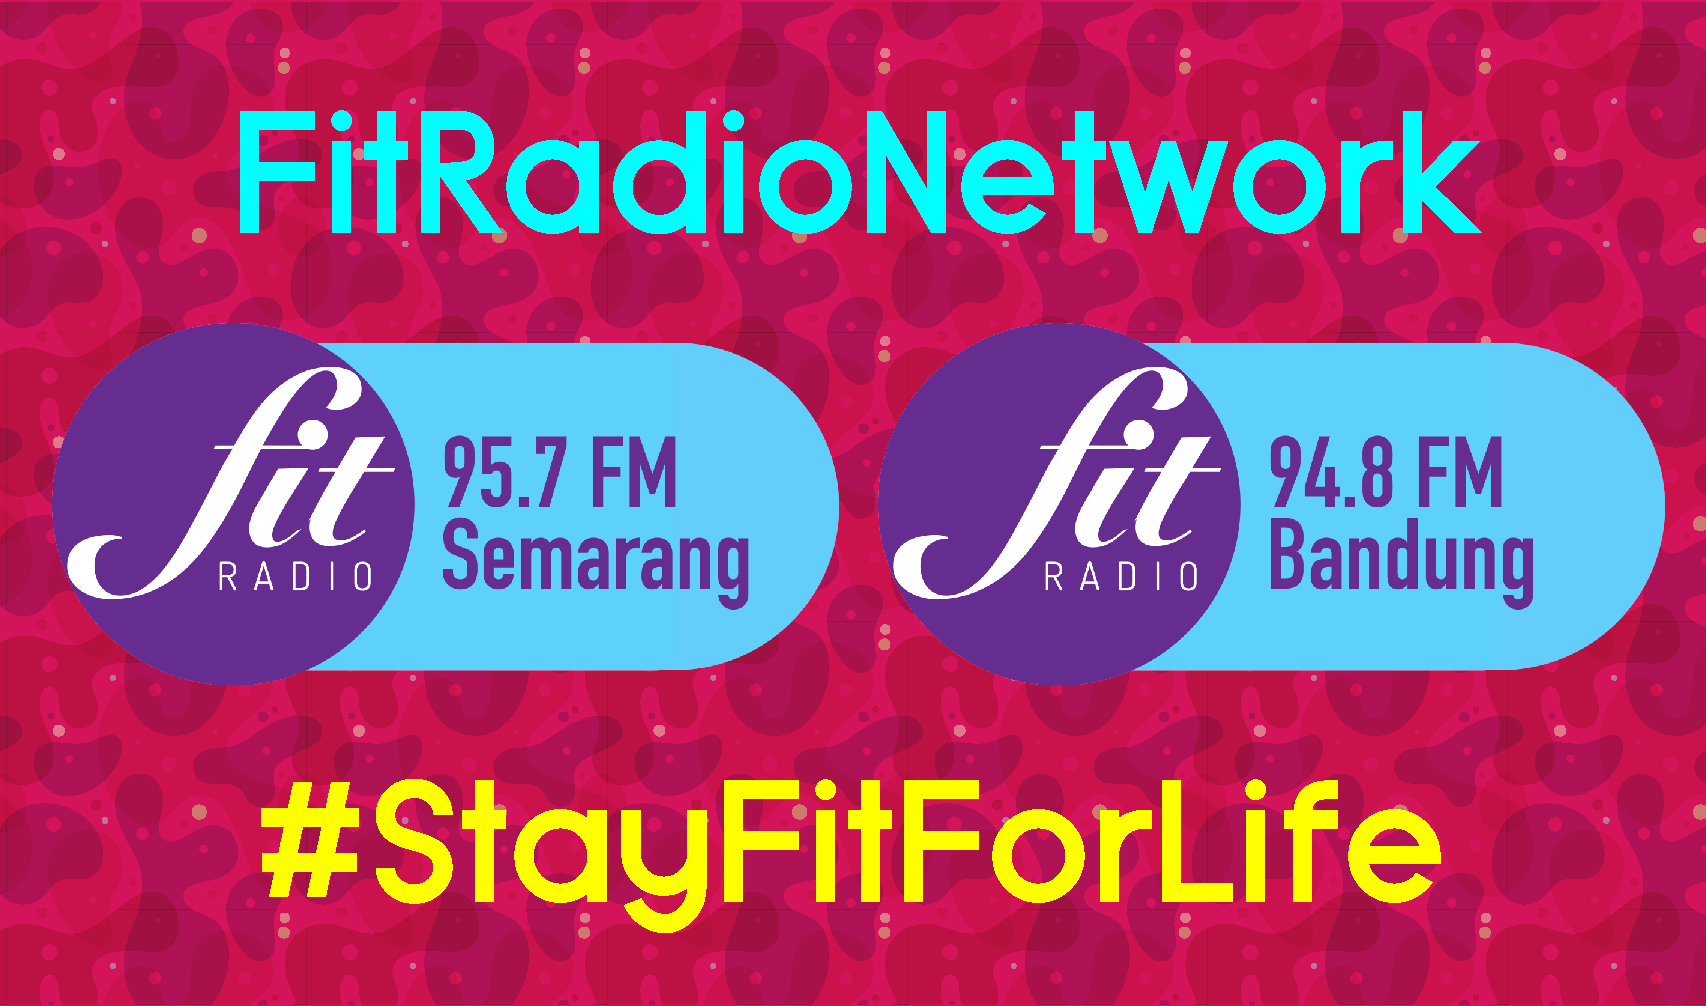 Siaran FitRadio di Bandung dan Semarang mulai diperhitungkan sebagai